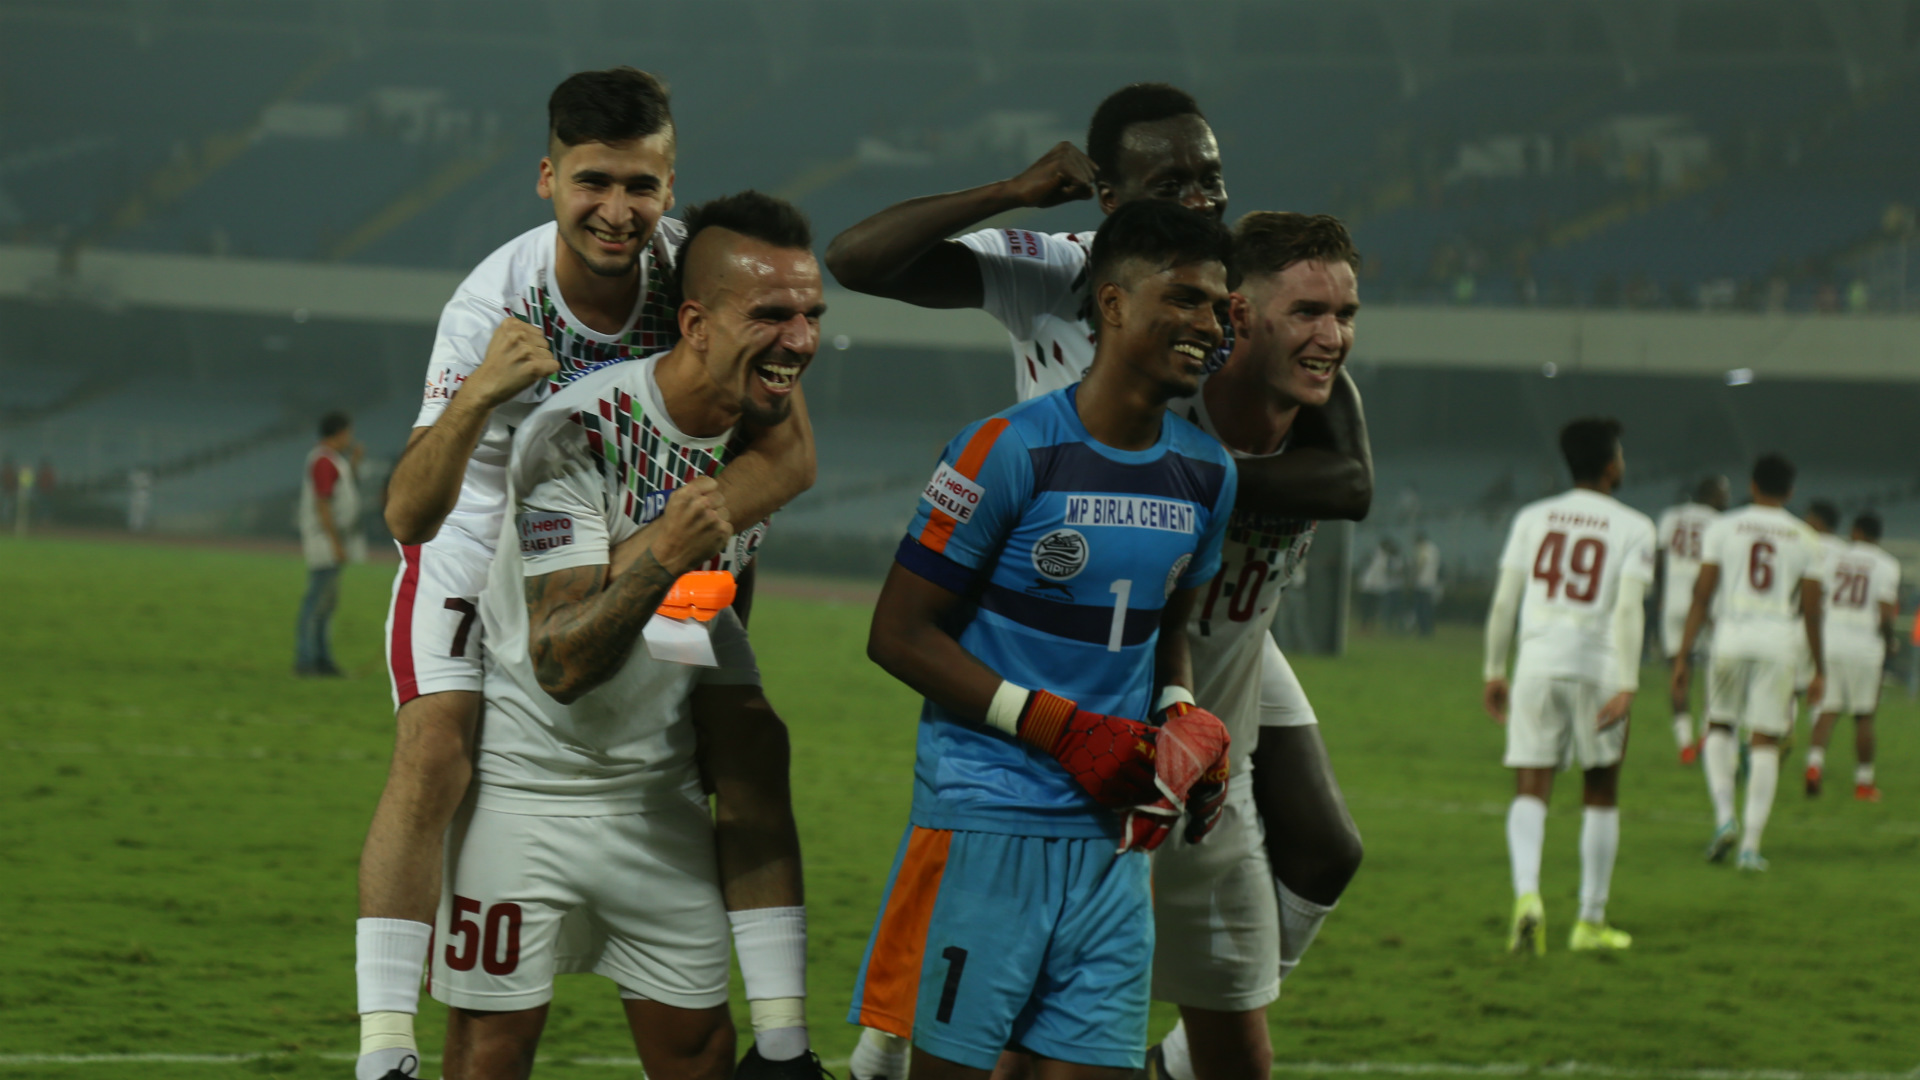 Mohun Bagan East Bengal I-League 2019-20